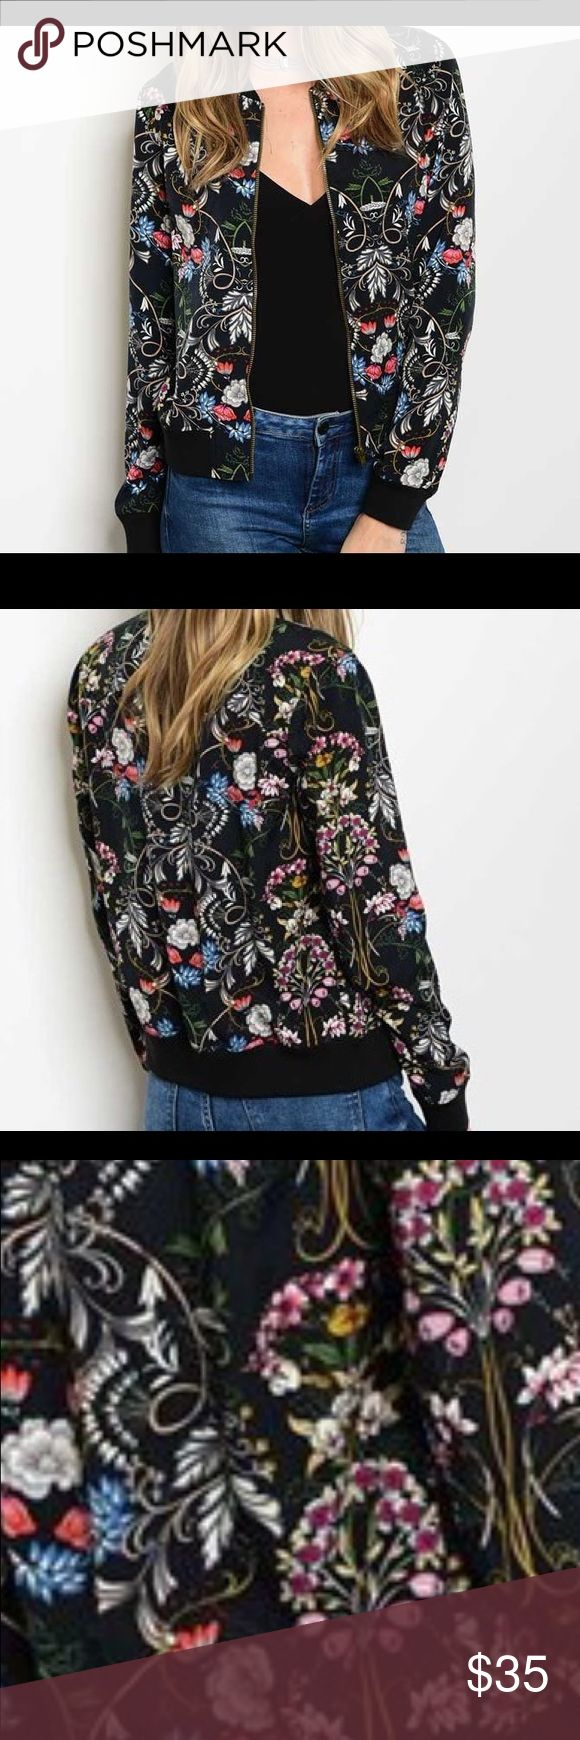 SHIPS 29th! Gorgeous black floral bomber jacket! Long sleeve zipper front closure floral print bomber jacket. Beautiful colors Jackets & Coats